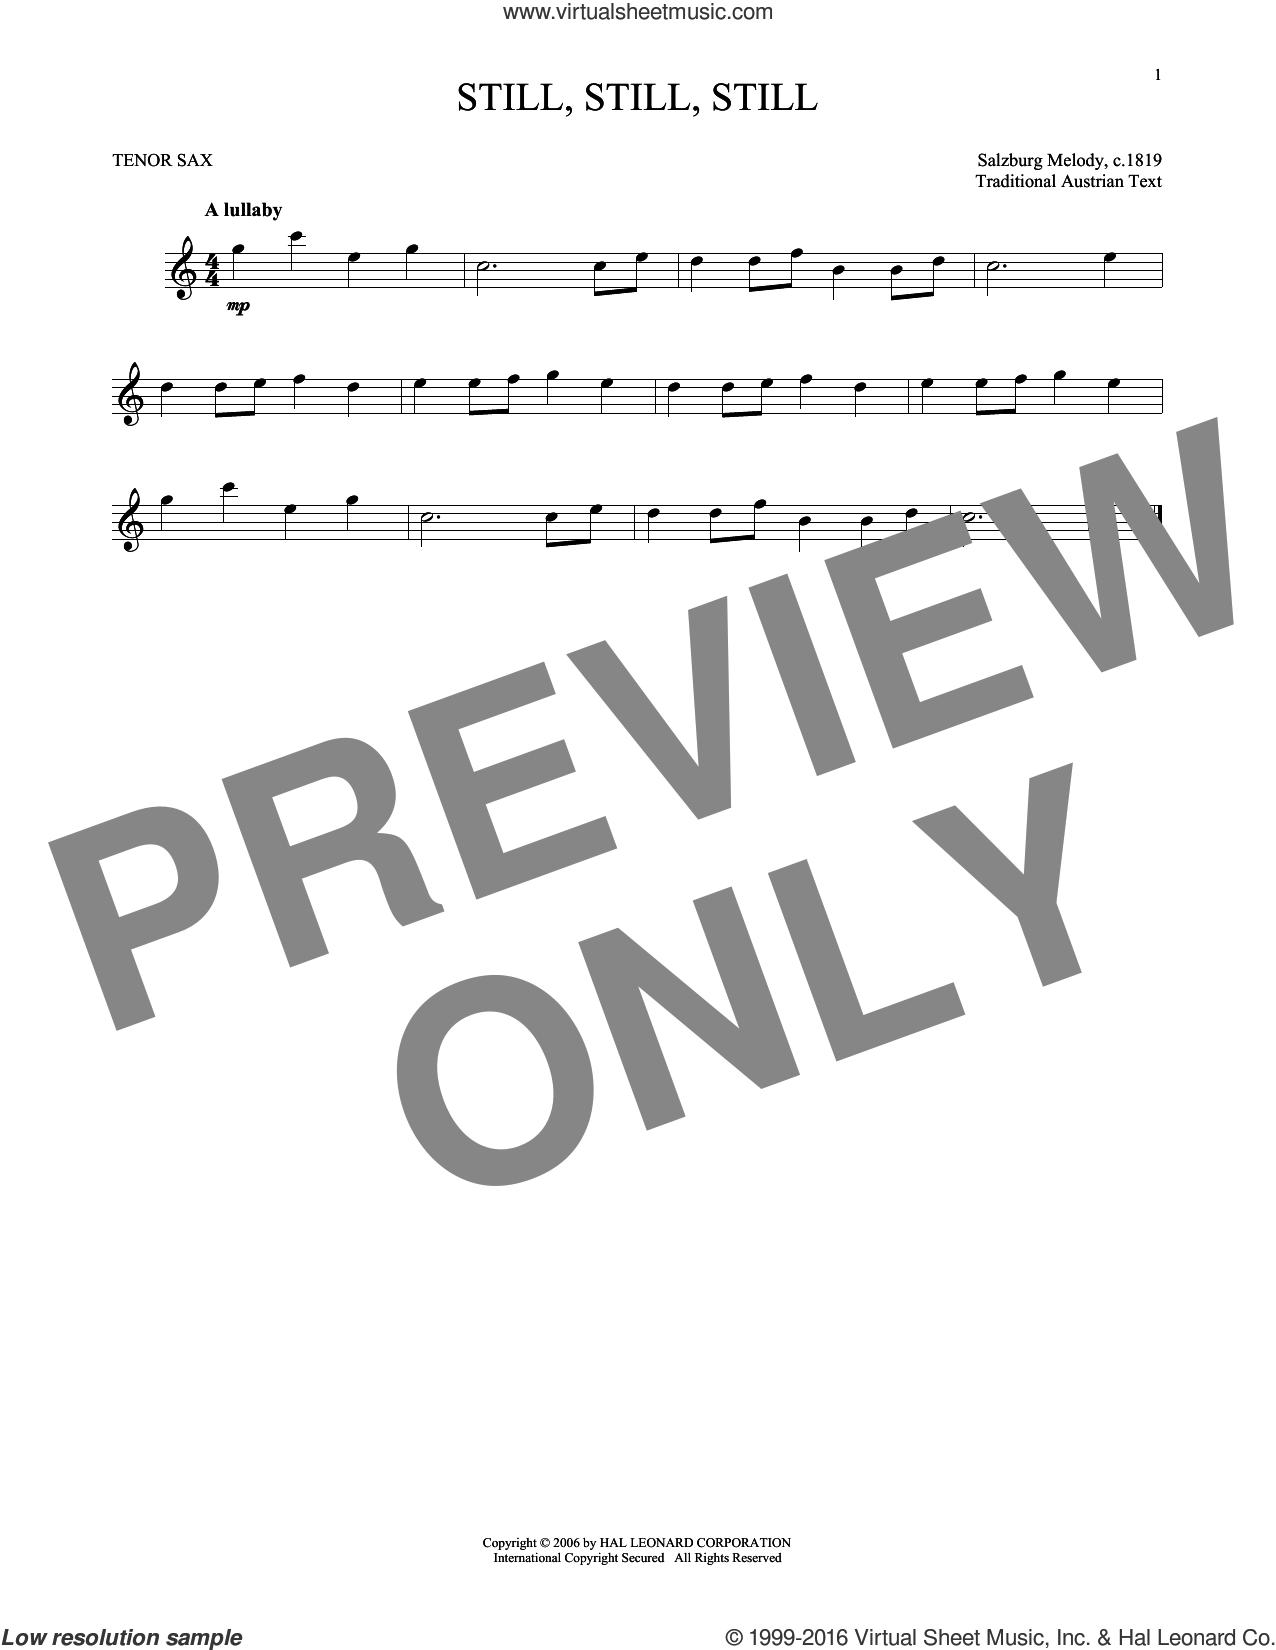 Still, Still, Still sheet music for tenor saxophone solo by Salzburg Melody c.1819 and Miscellaneous, intermediate skill level